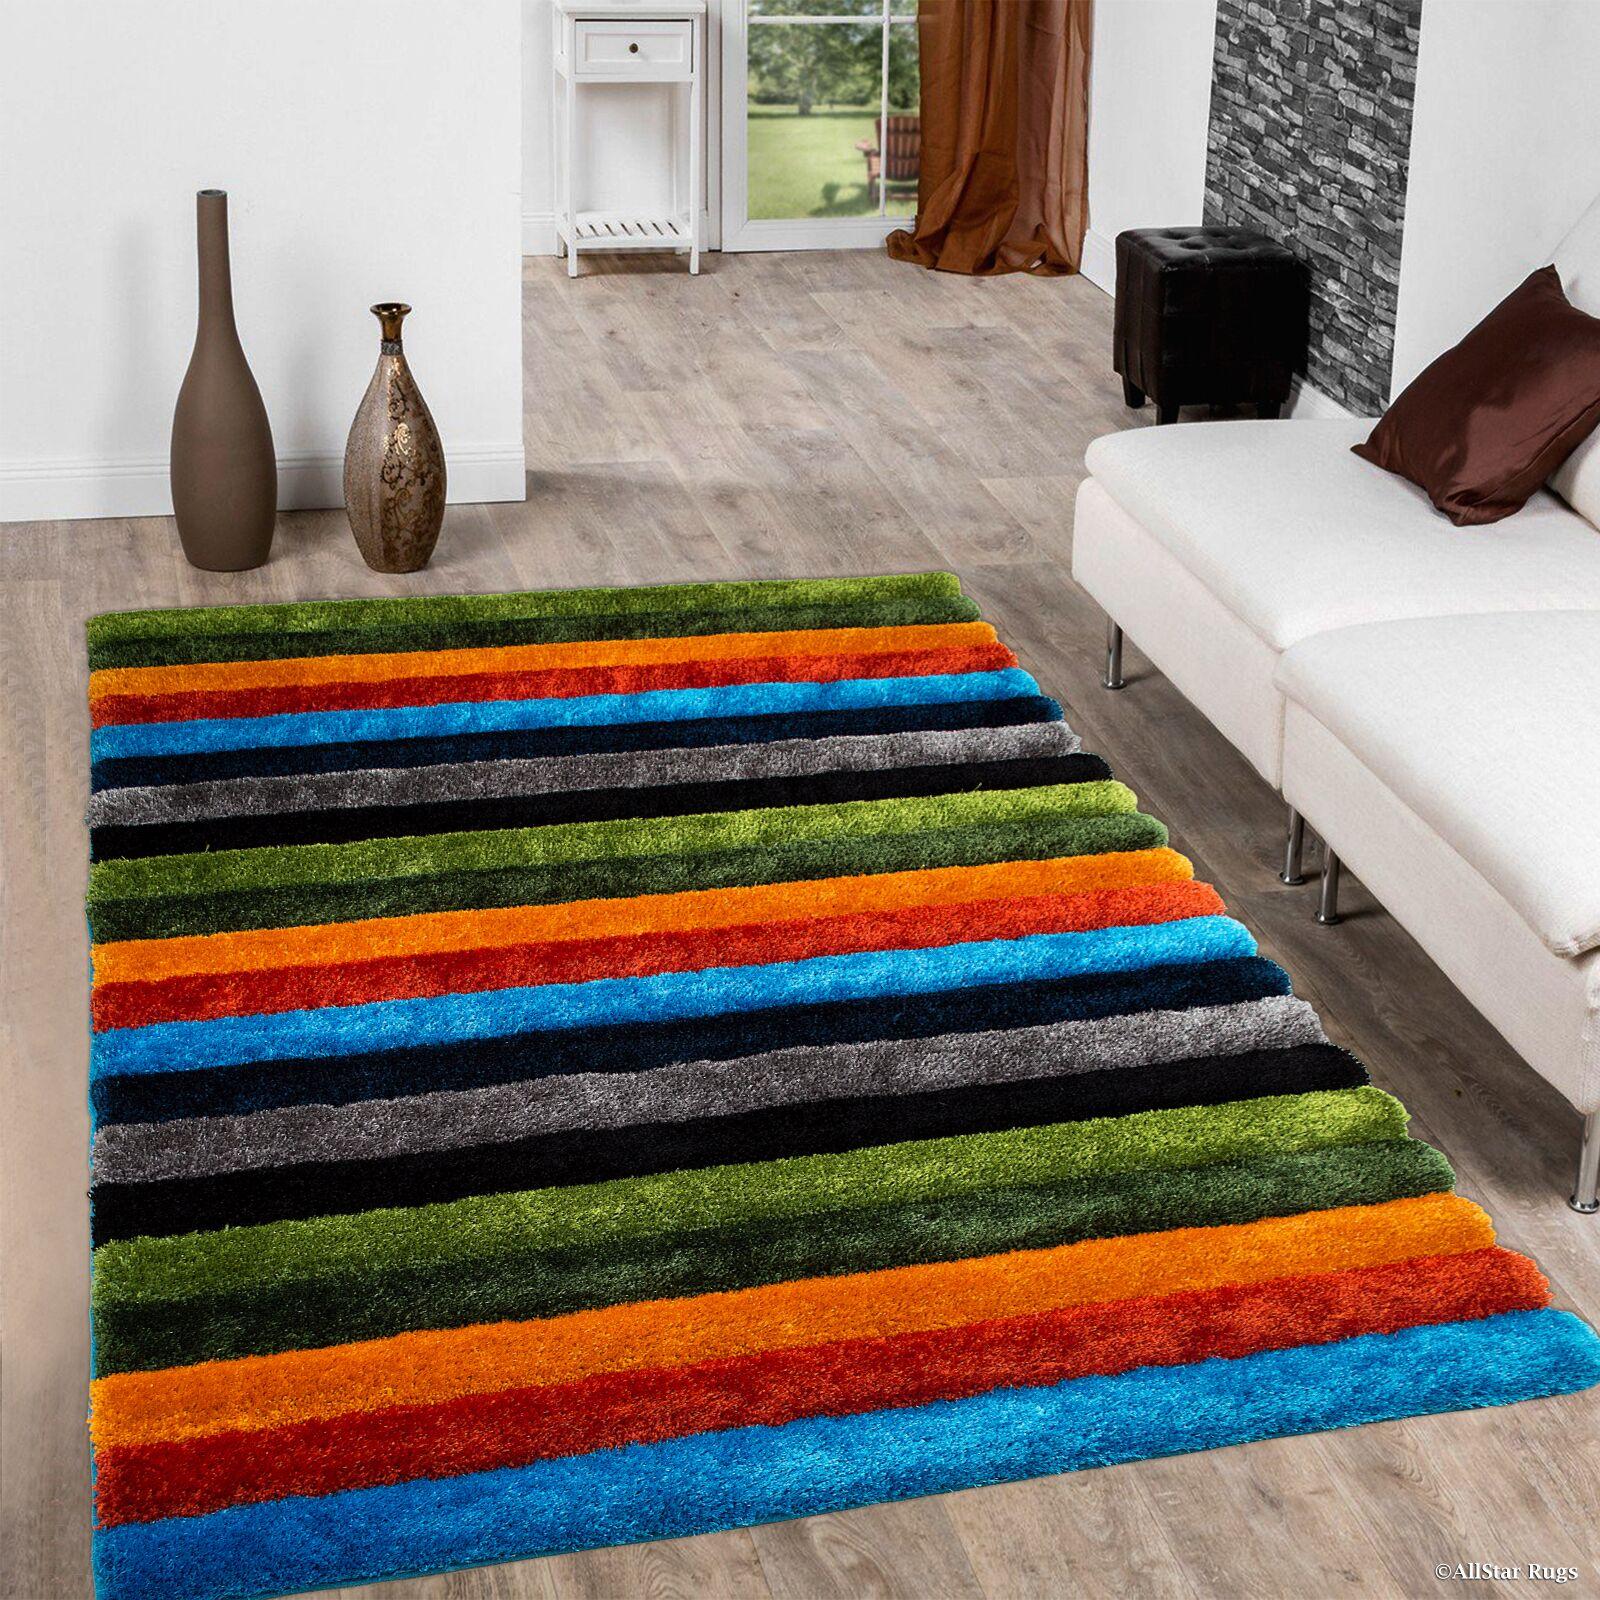 Keane Green/Blue/Orange Area Rug Rug Size: 5' x 7'